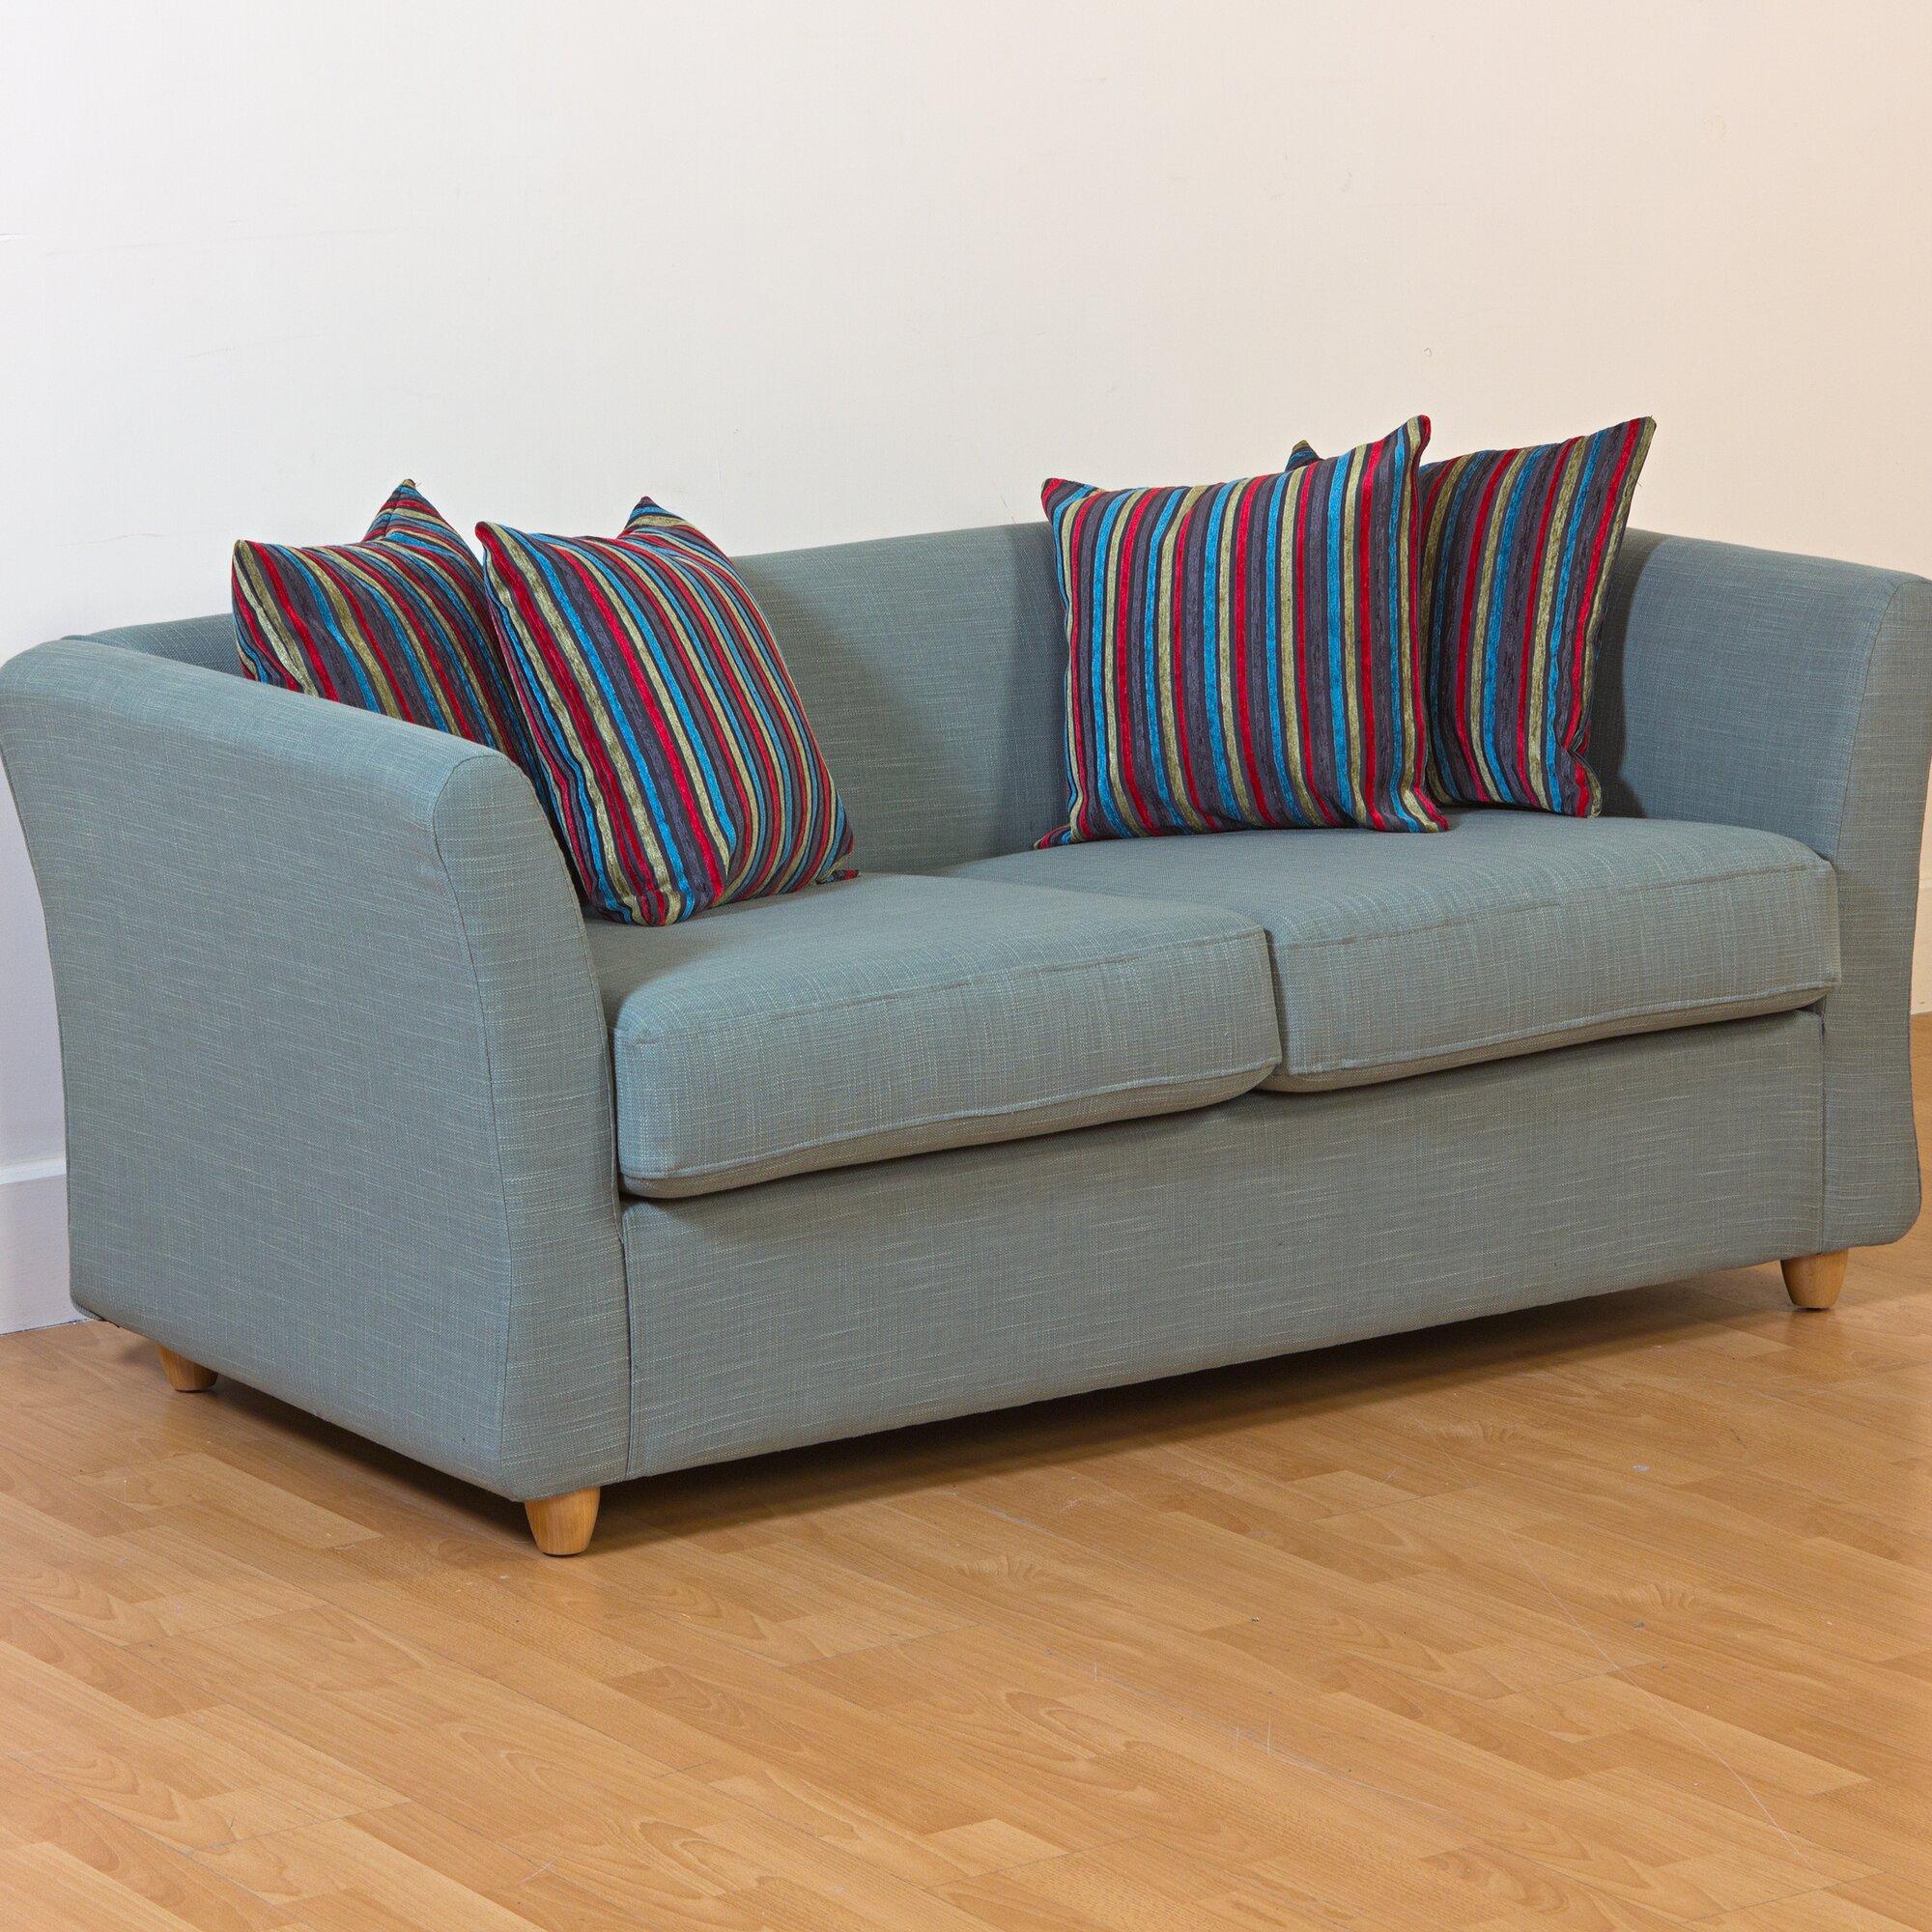 kyoto 2 sitzer schlafsofa kendal bewertungen. Black Bedroom Furniture Sets. Home Design Ideas